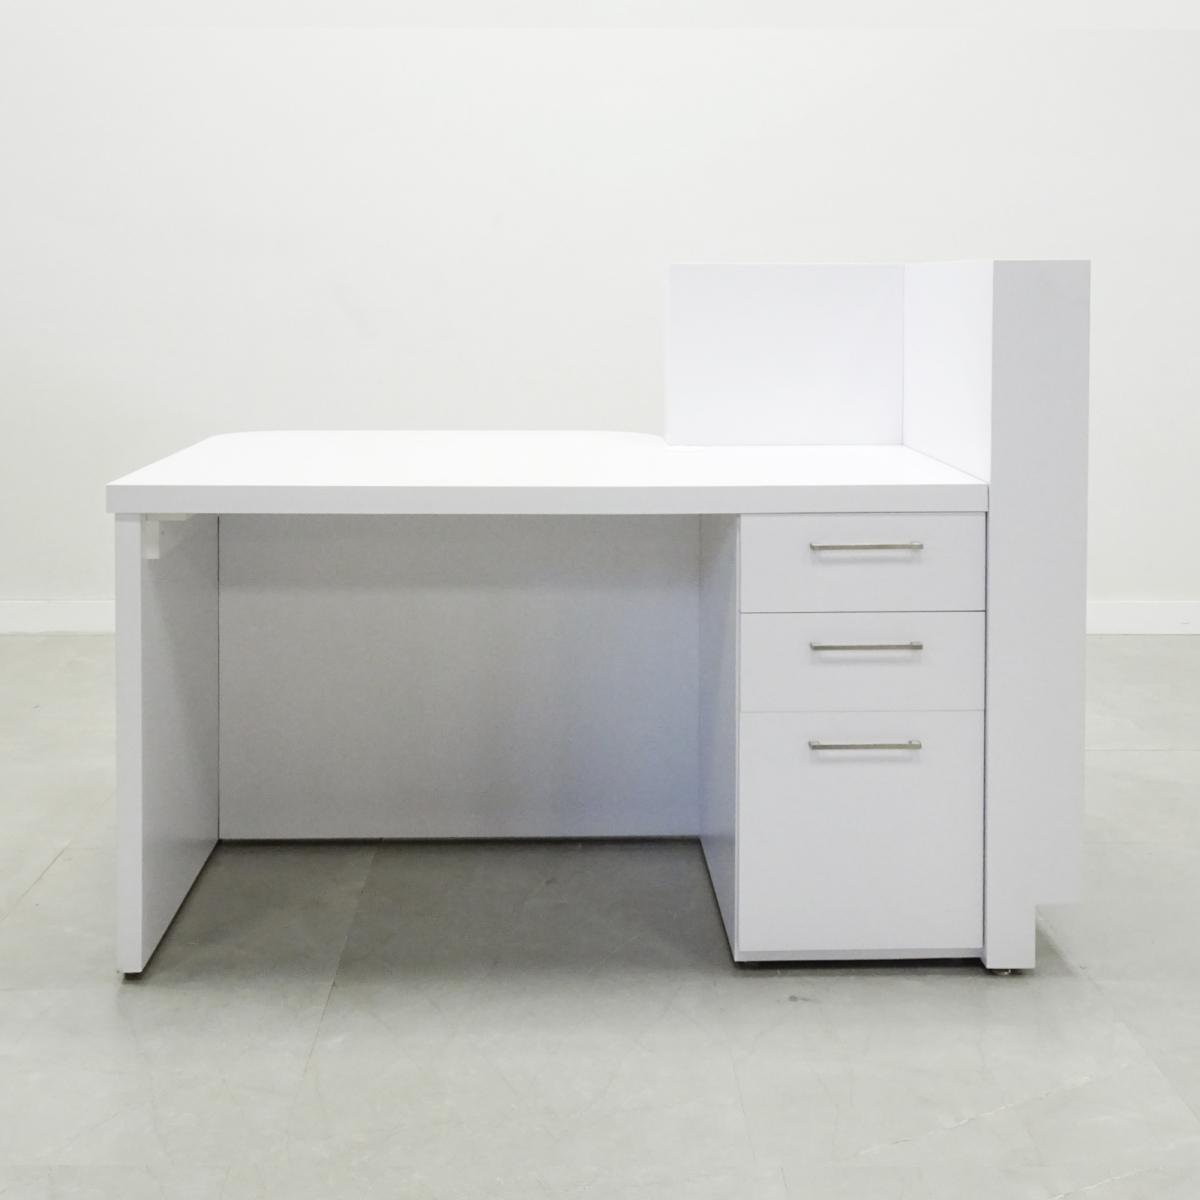 Dallas ADA Custom Reception Desk